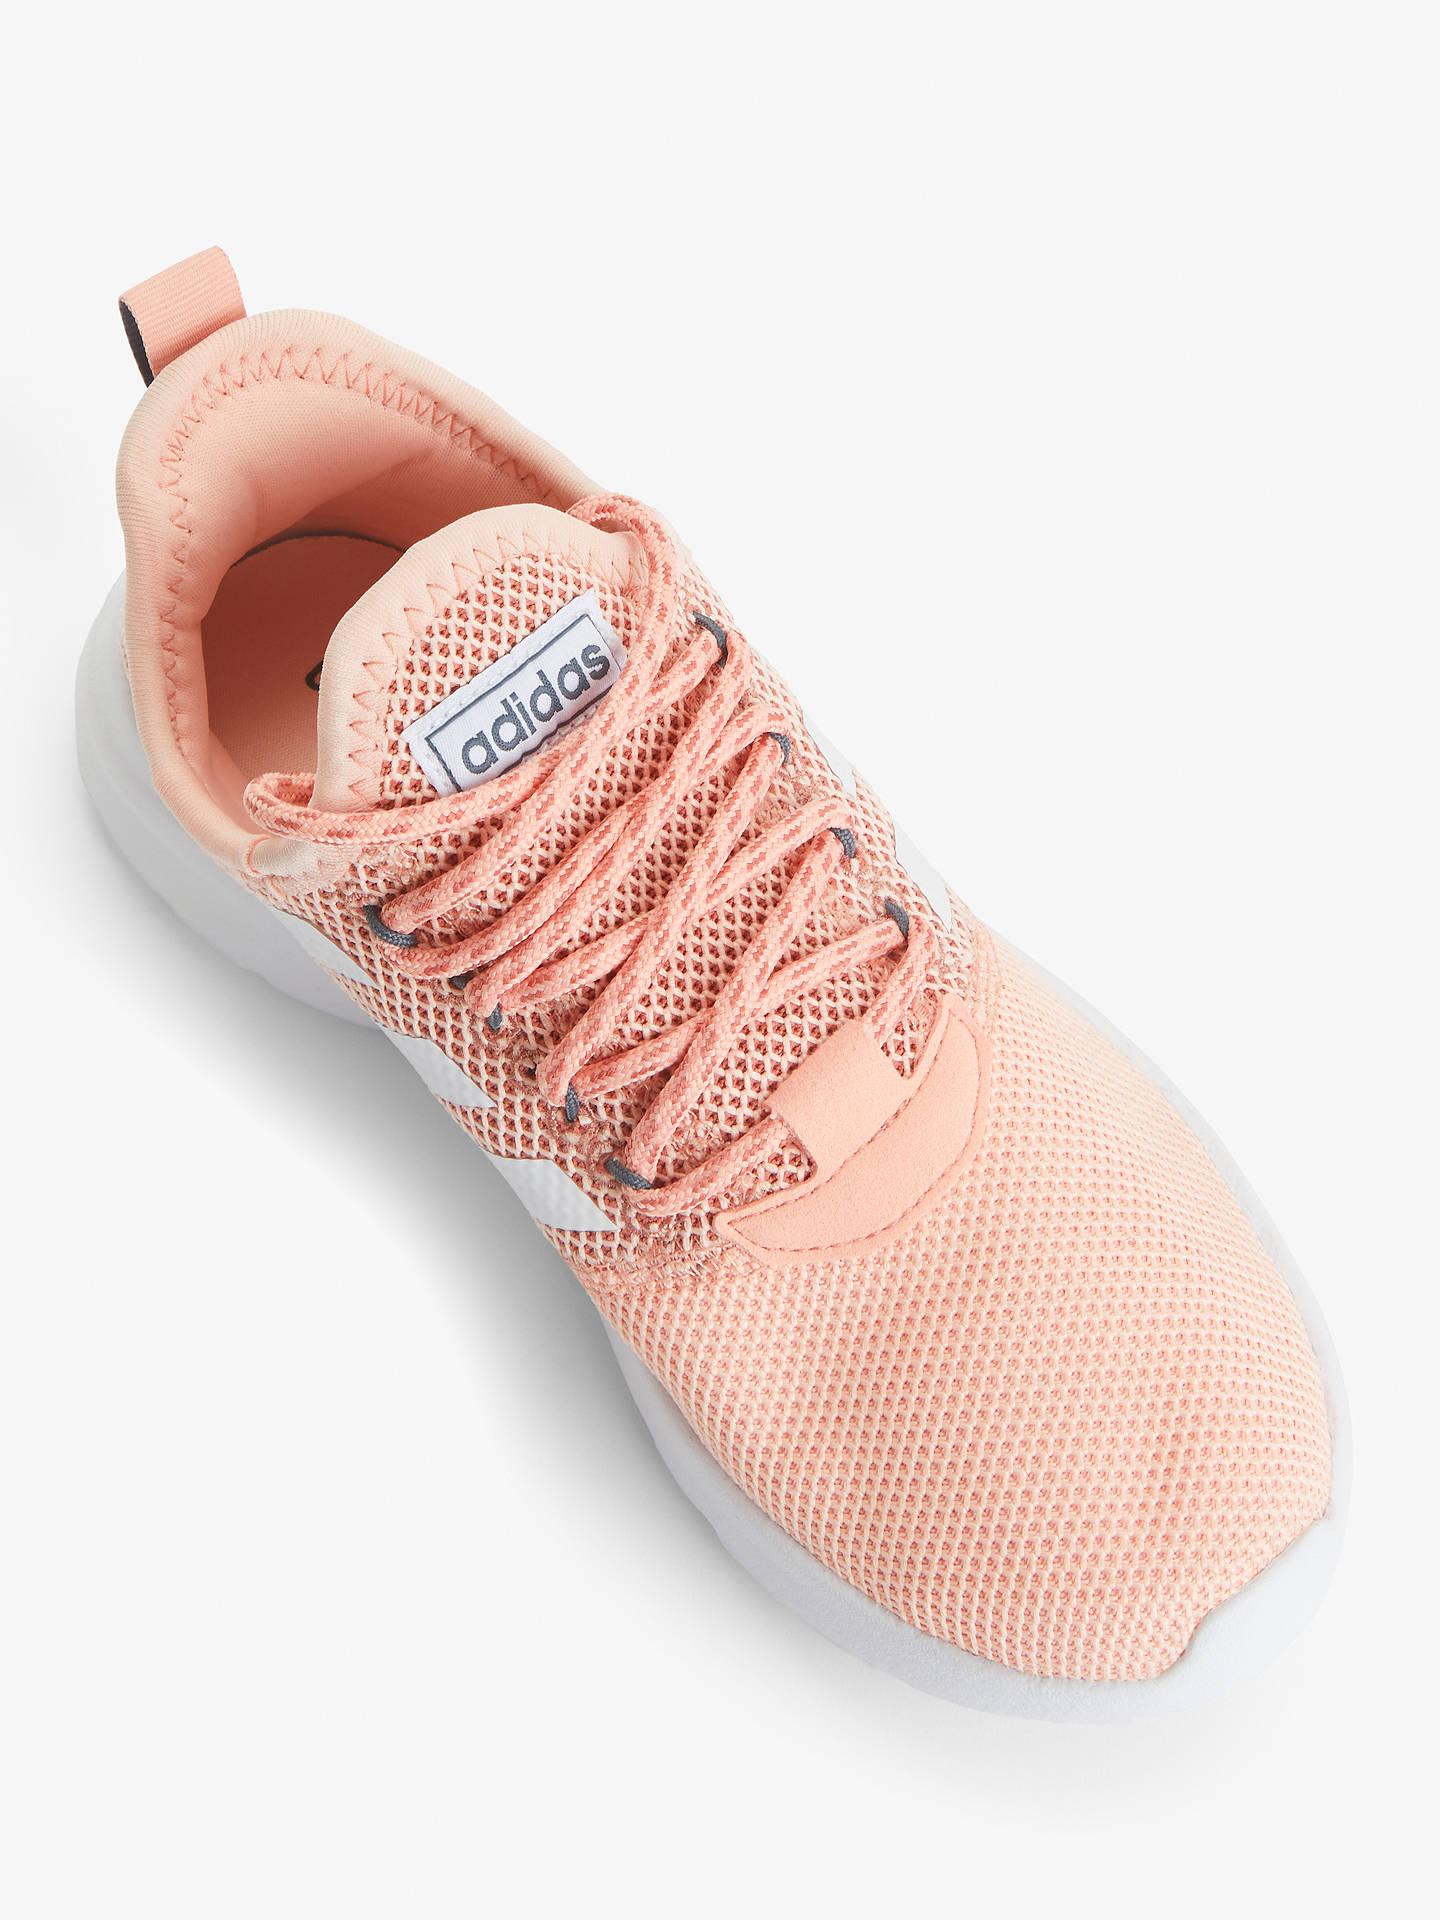 adidas Lite Racer RBN Women's Running Shoes, Glow PinkCloud WhiteOnix